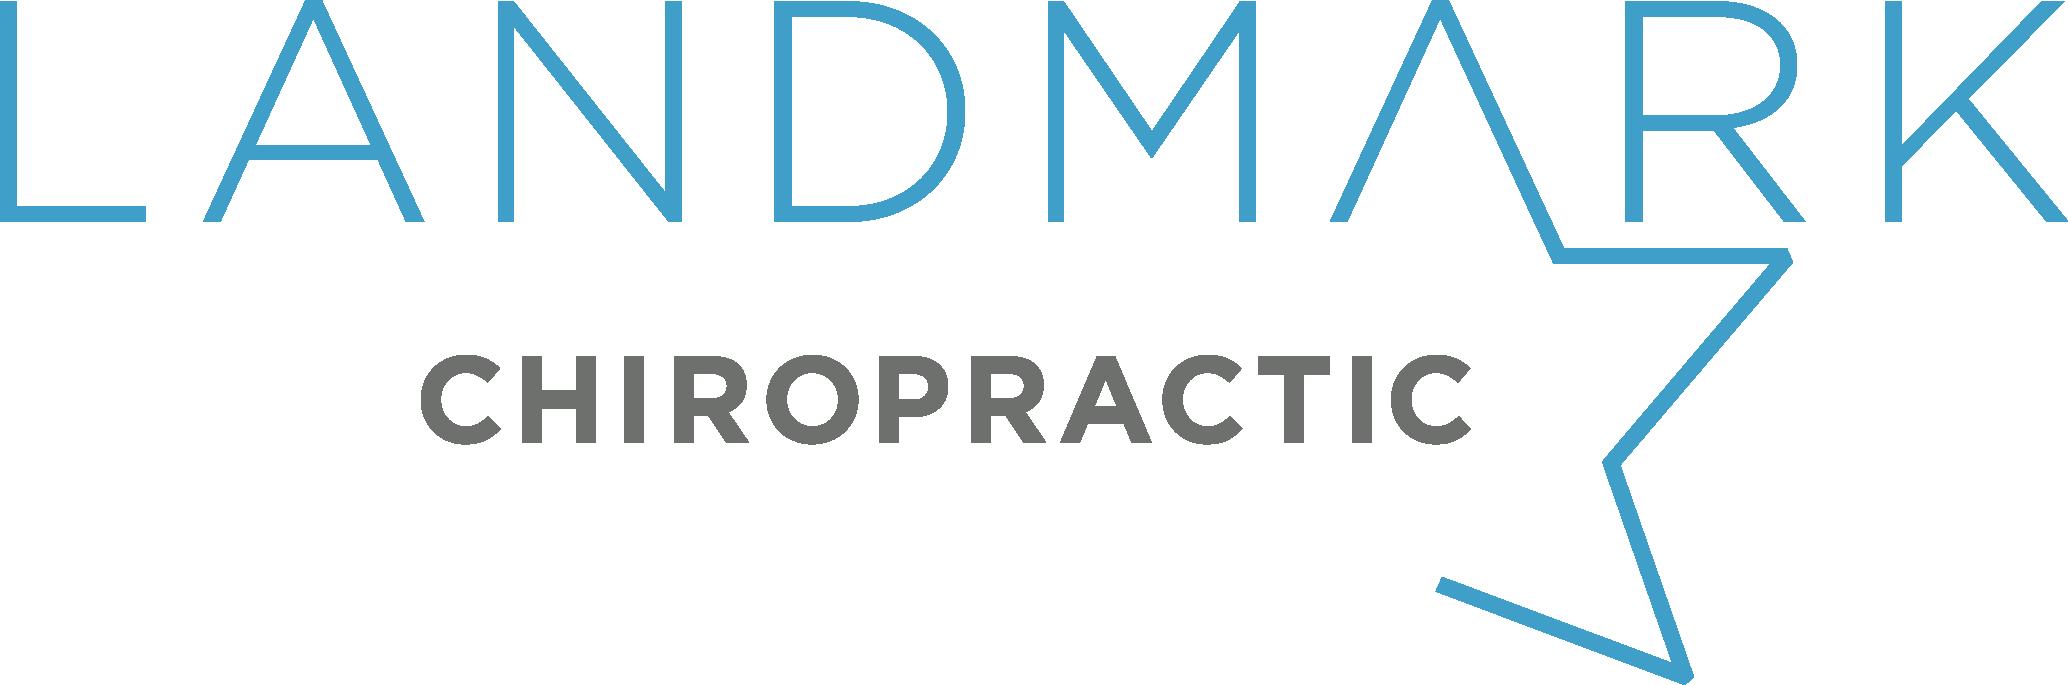 Landmark Chiropractic